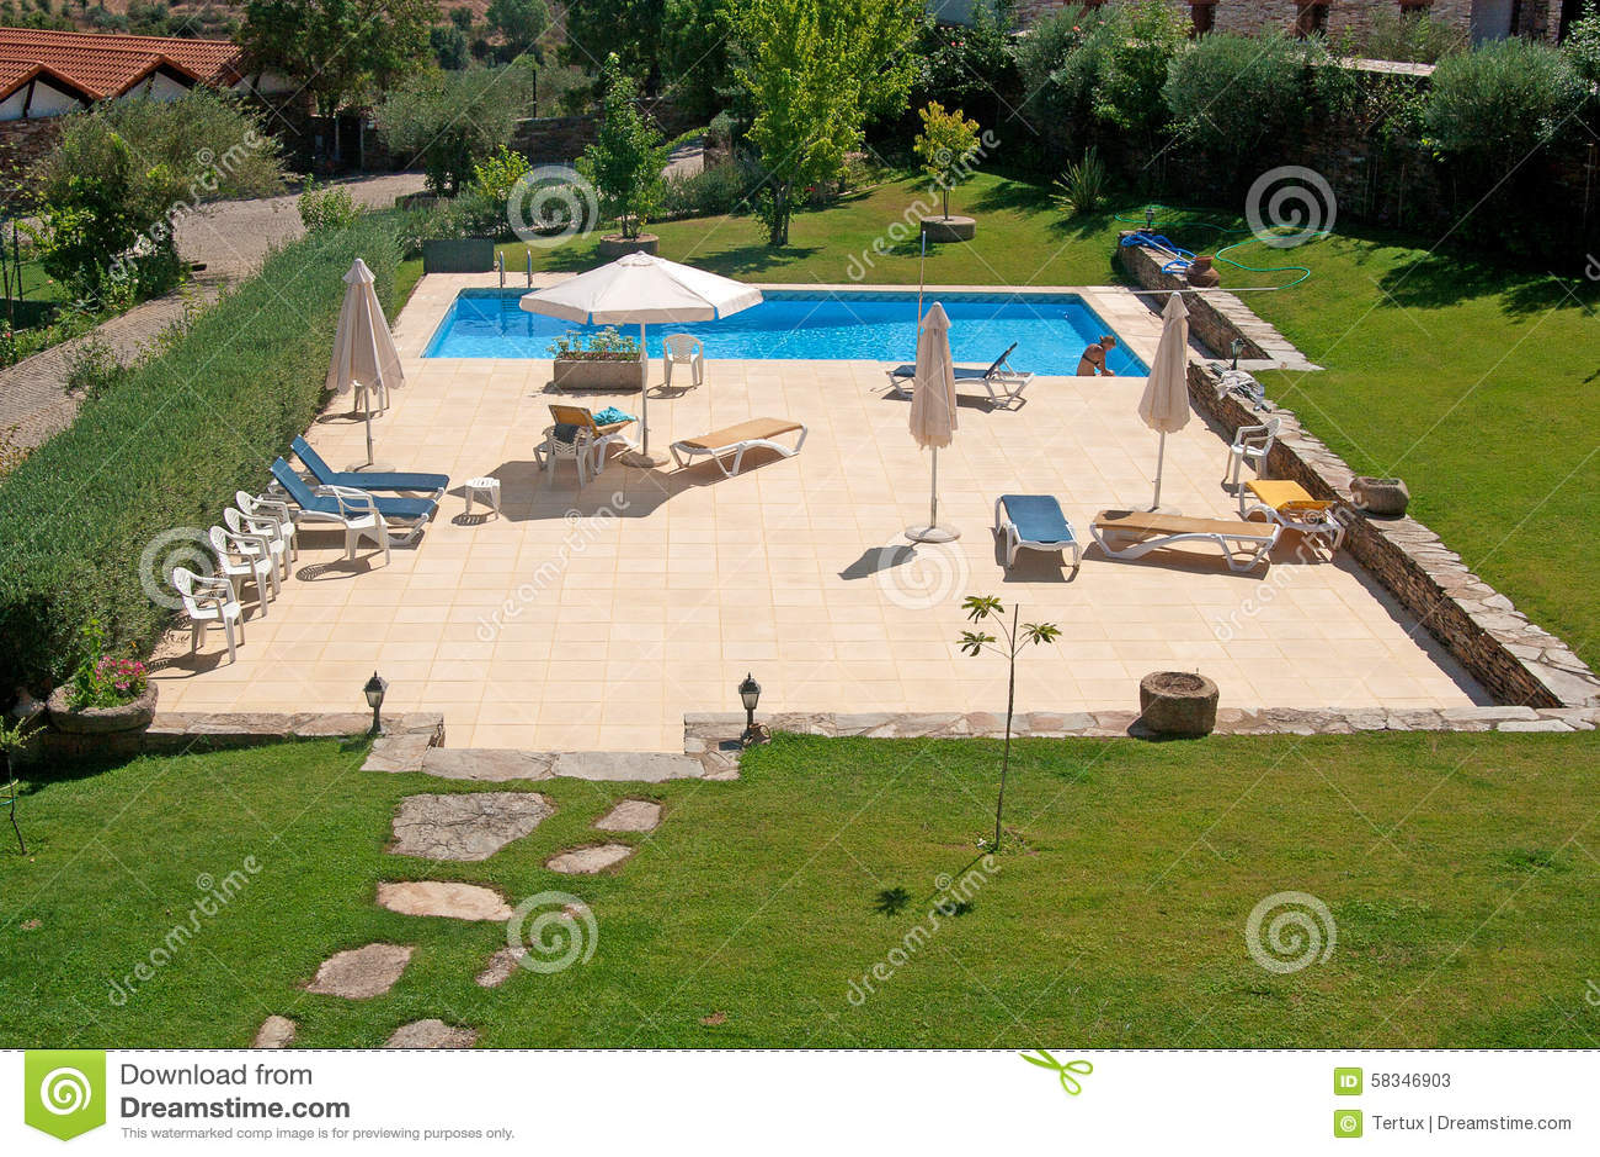 Swimming Pool Stock Photo Image 58346903